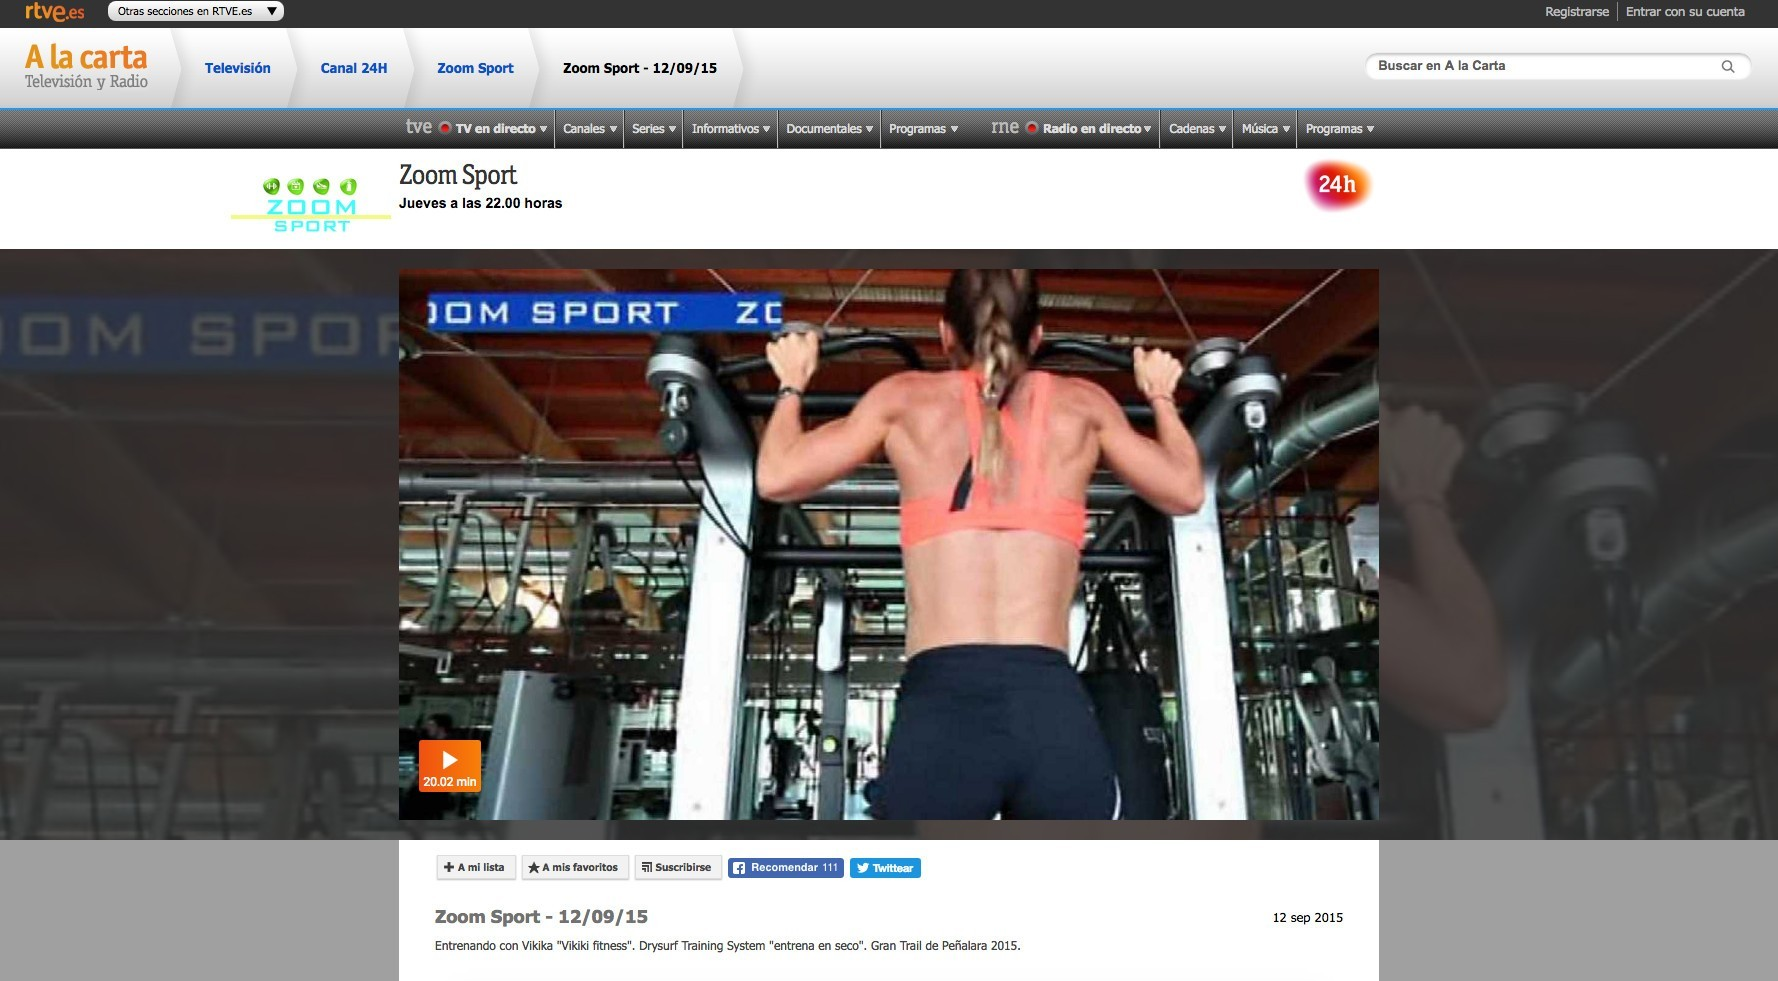 Rtve Zoom Sport 12 09 15